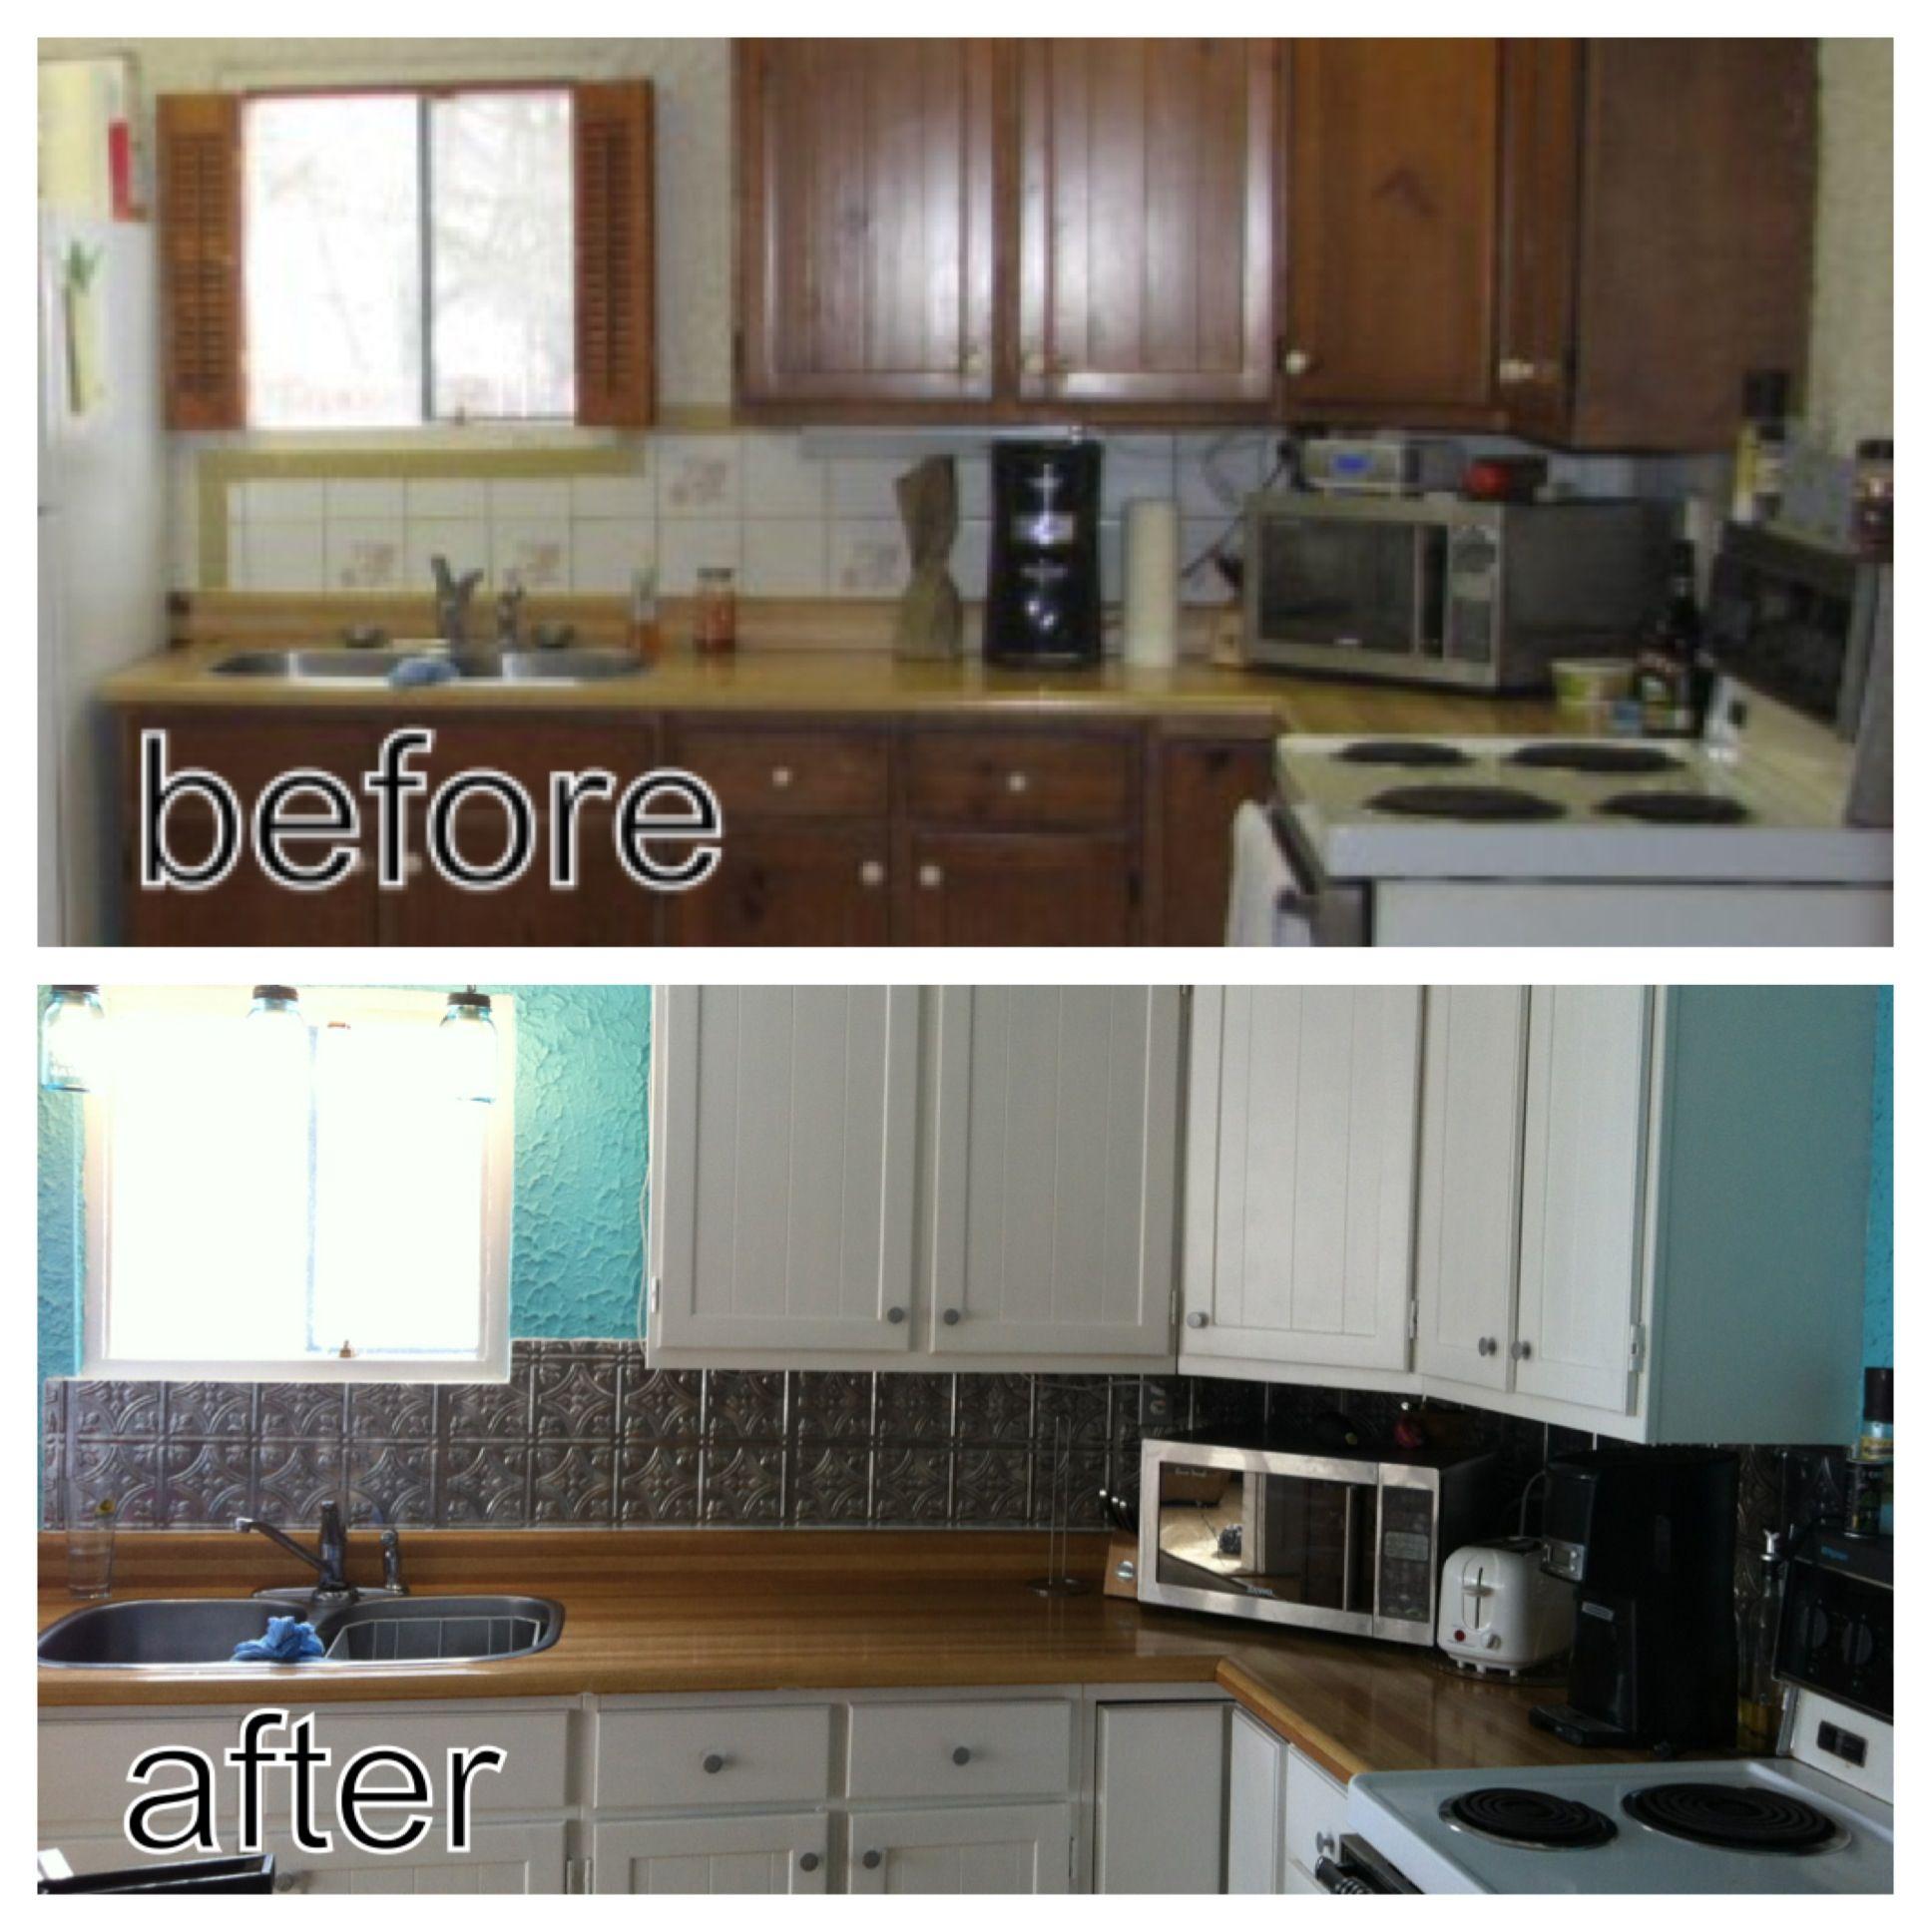 Tropical Kitchen Design Ideas Renovations Photos: Kitchens, Tropical Kitchen And Cupboard